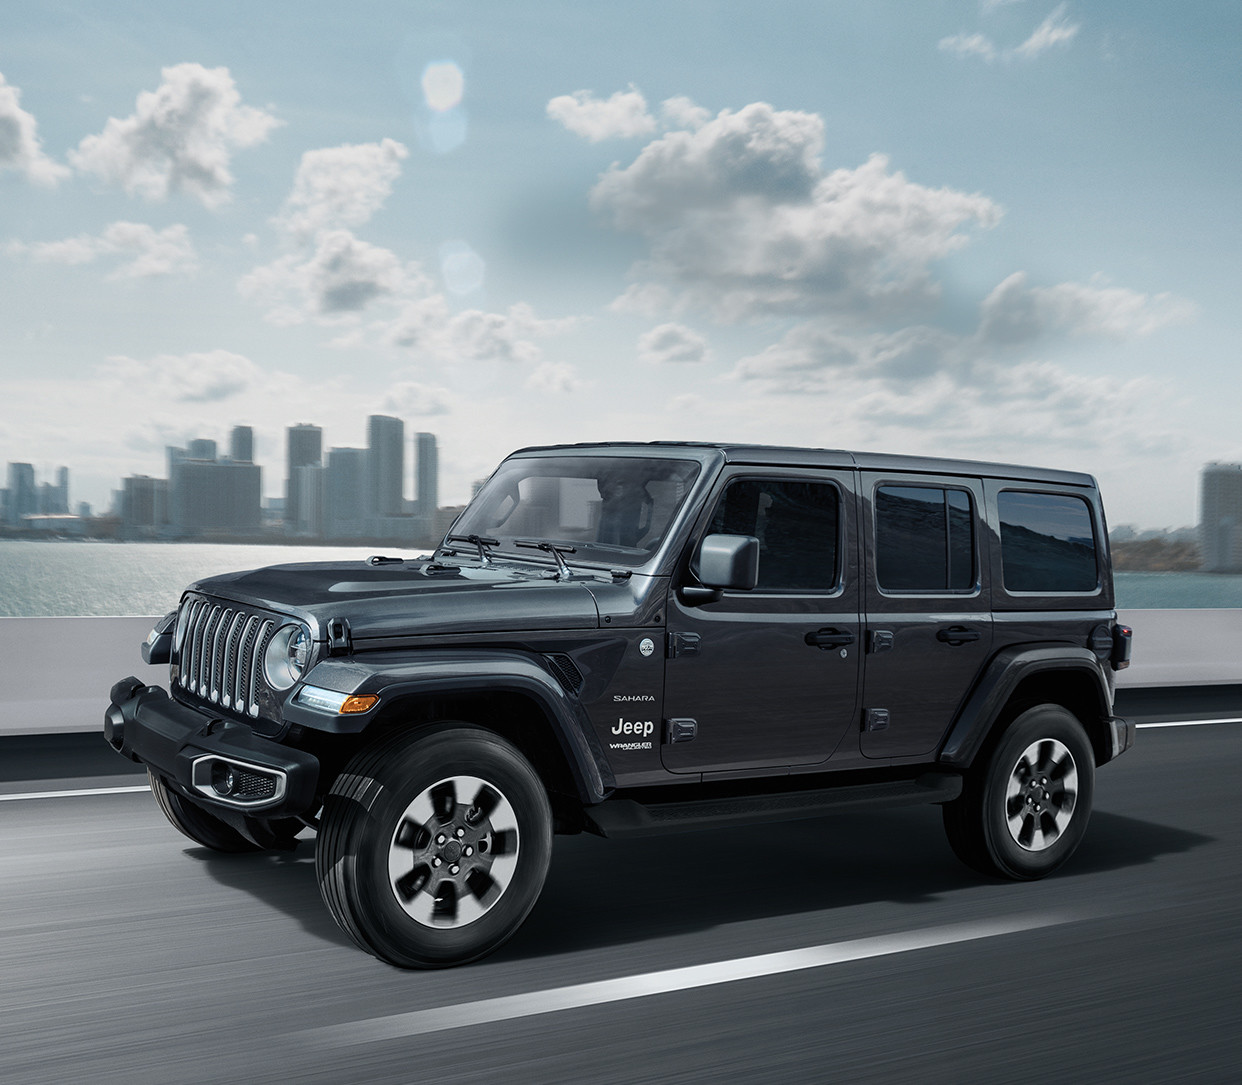 2019 Jeep Wrangler - Off Road 4x4 Vehicle